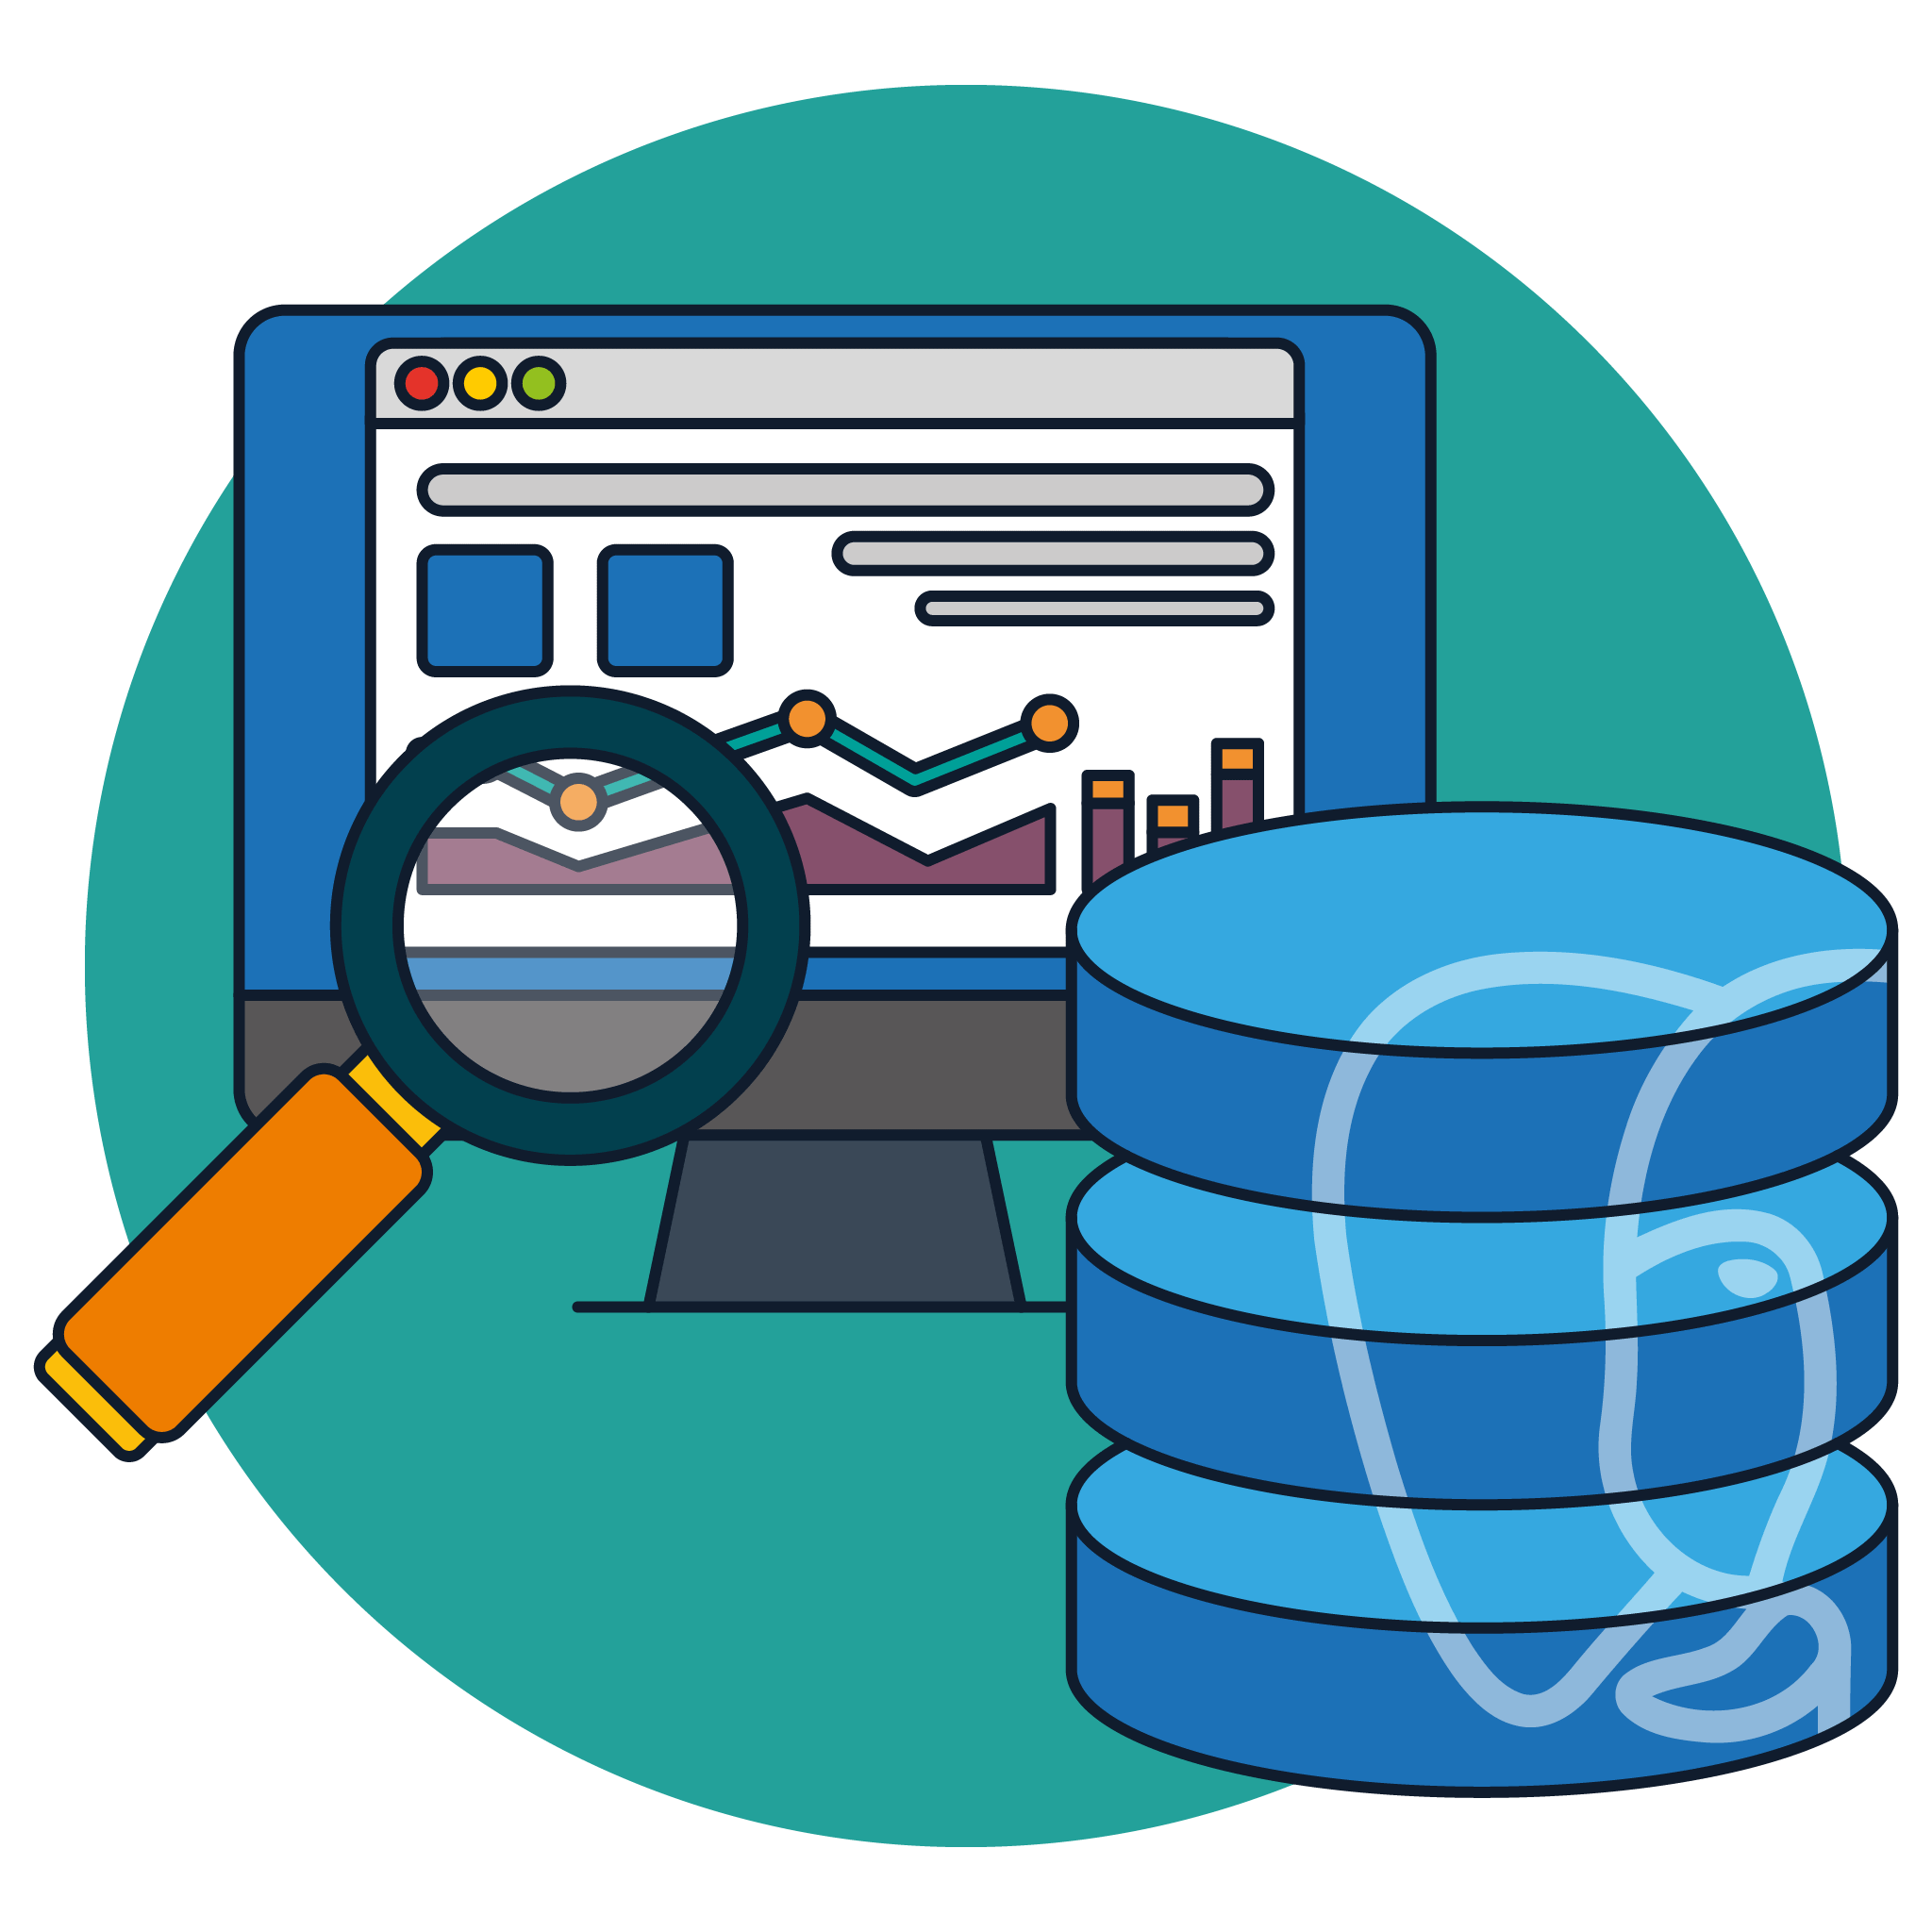 PostgreSQL DBA Service